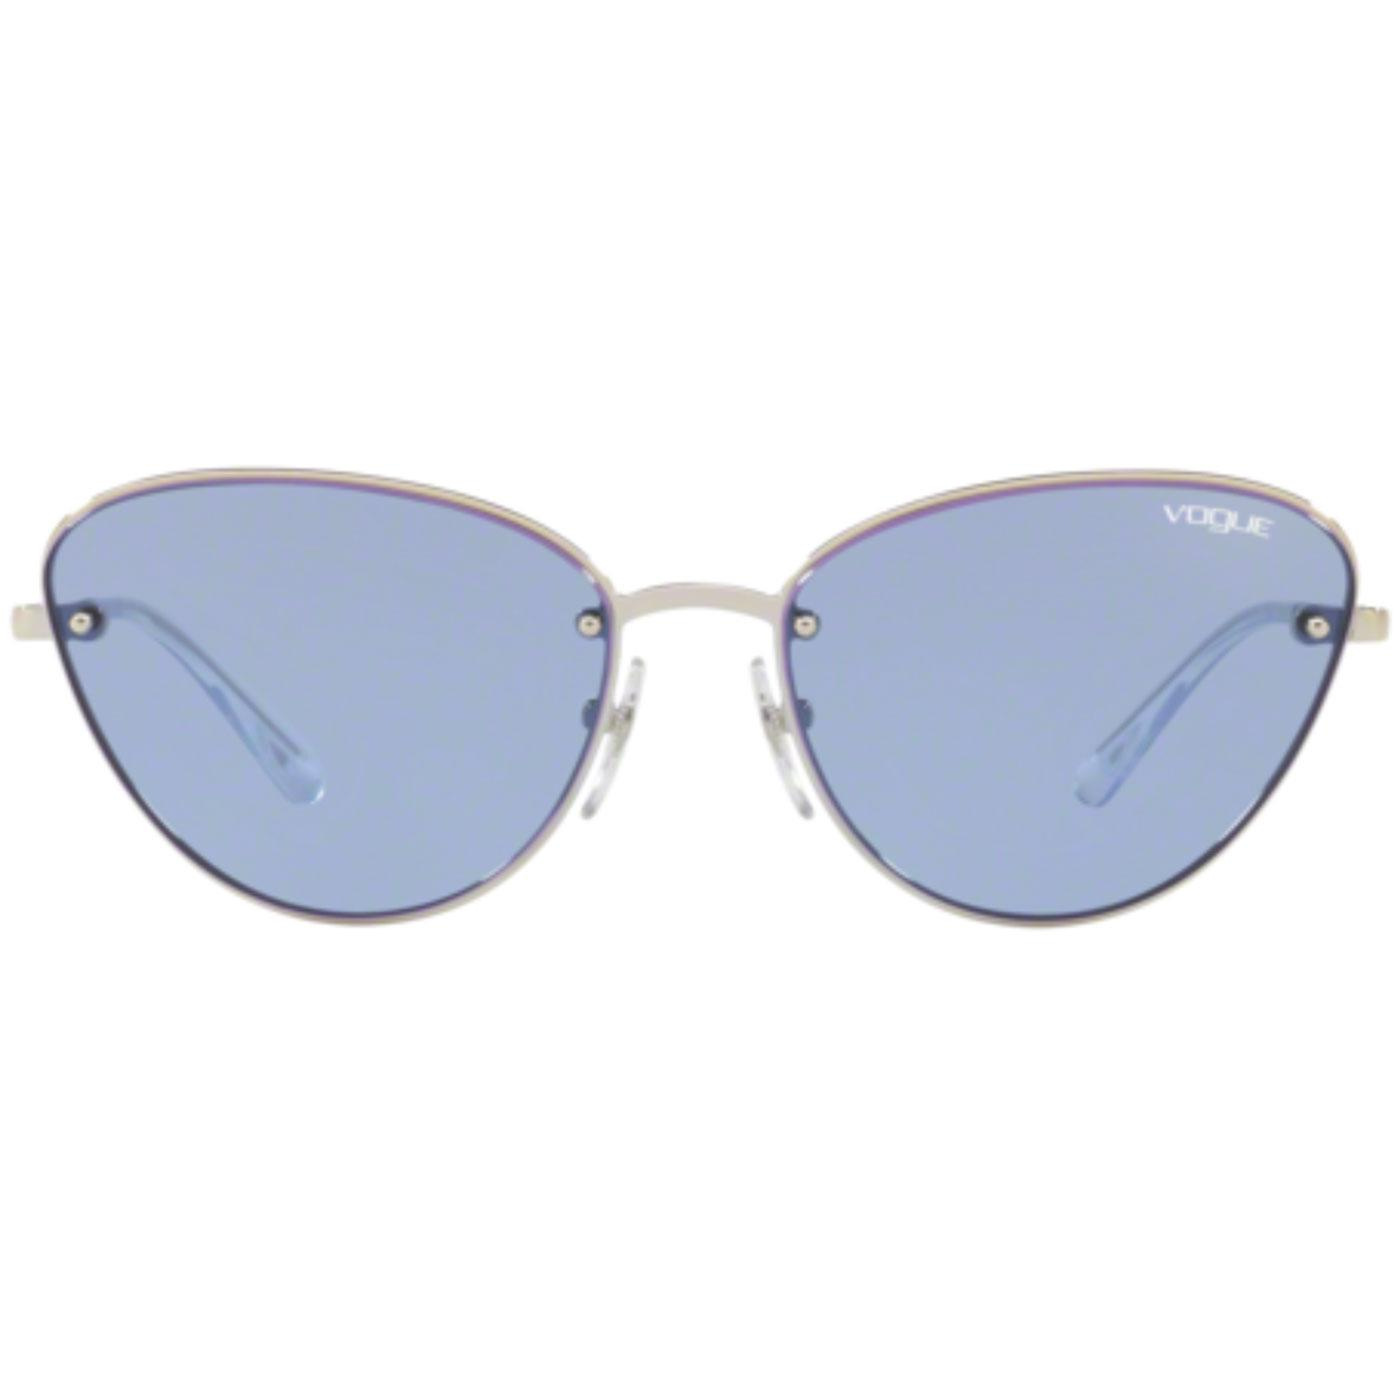 VOGUE Retro 60s Flat Front Cats-Eye Sunglasses V